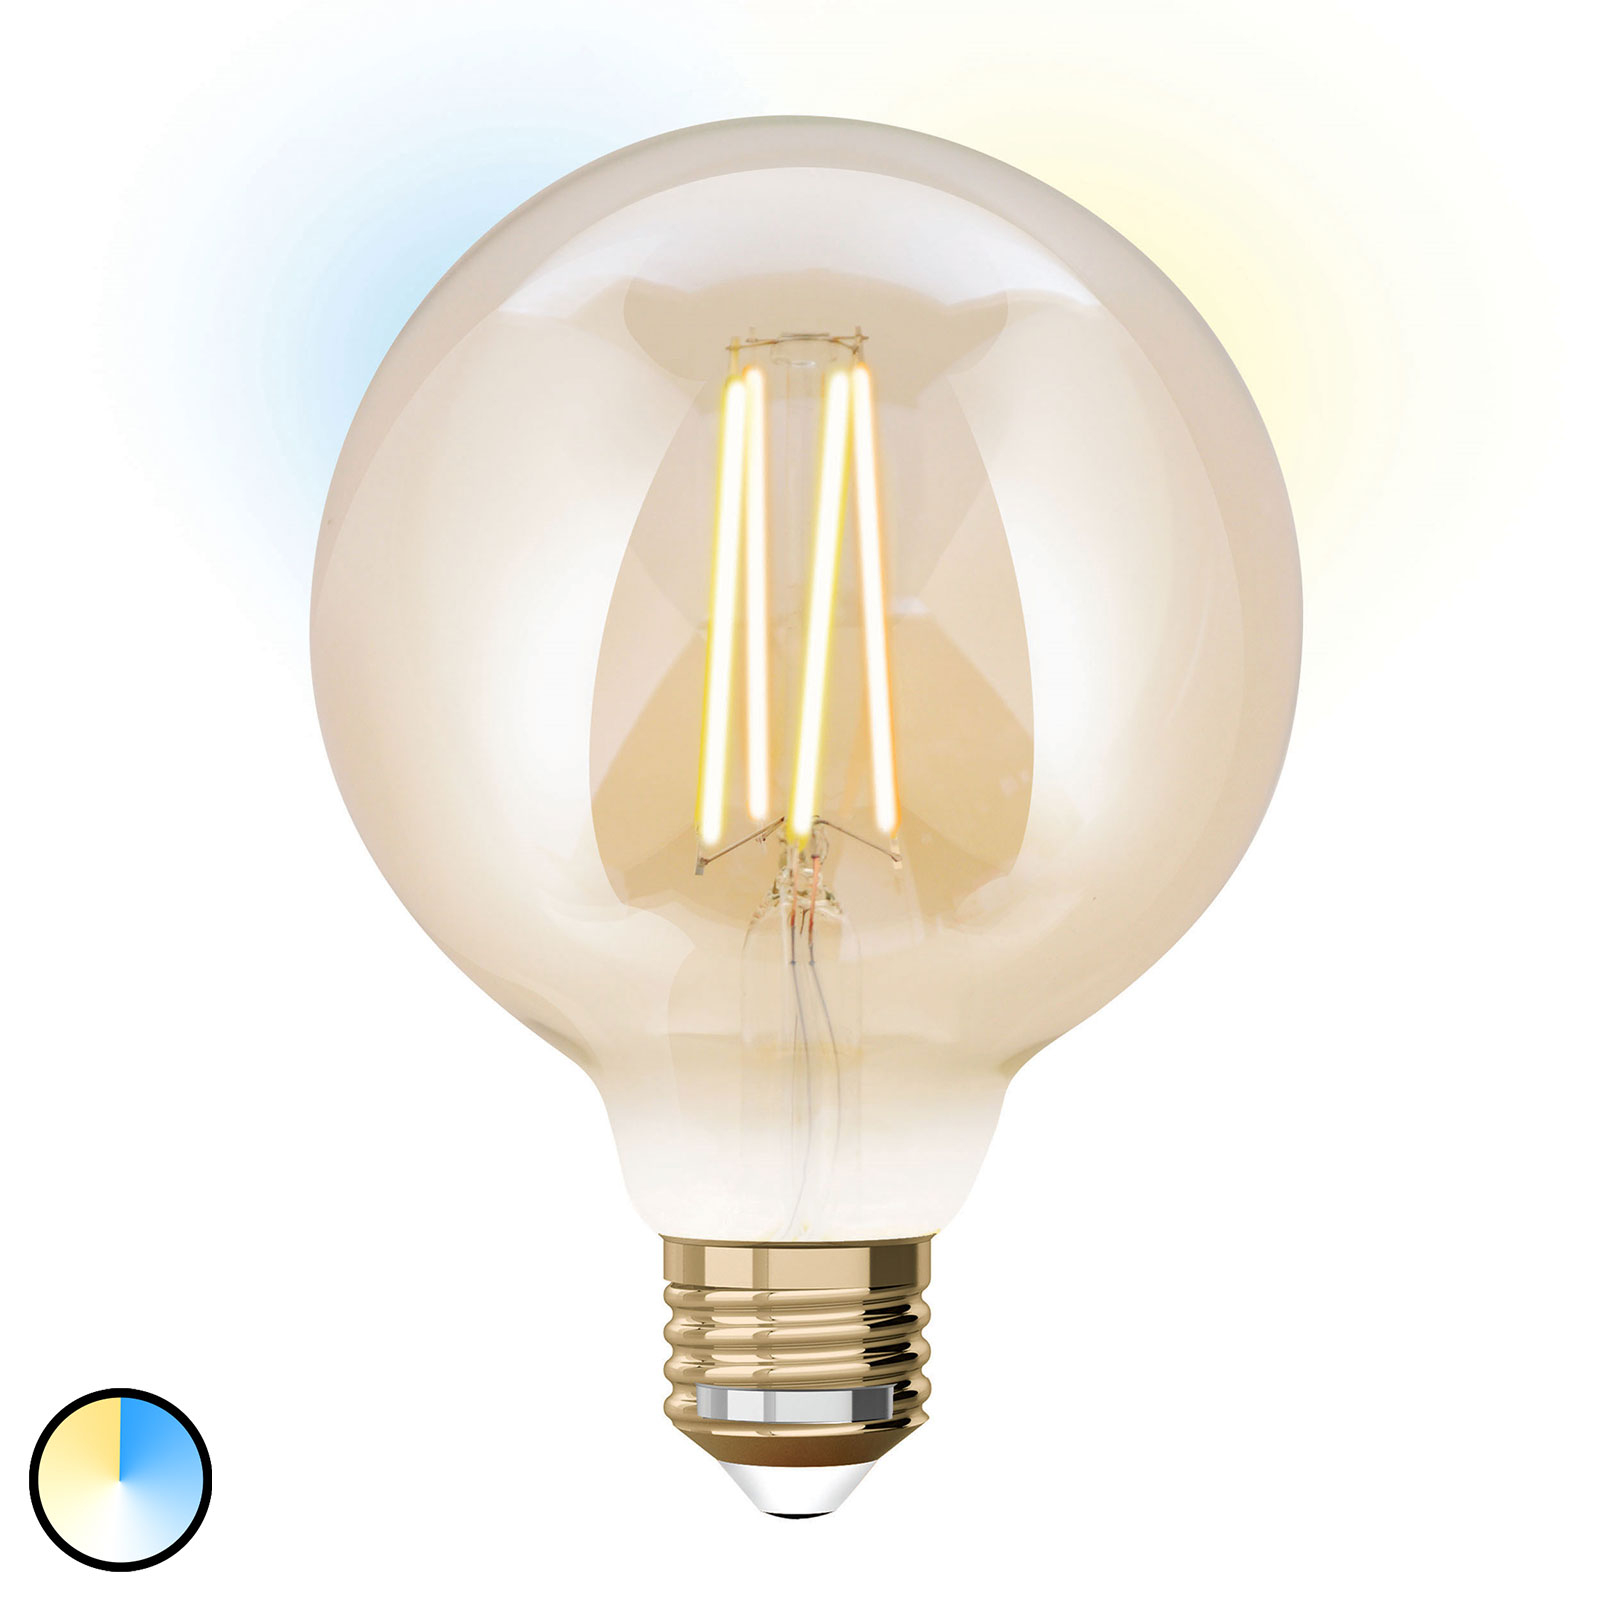 iDual LED-globlampa E27 9 W utvidgning 9,5 cm